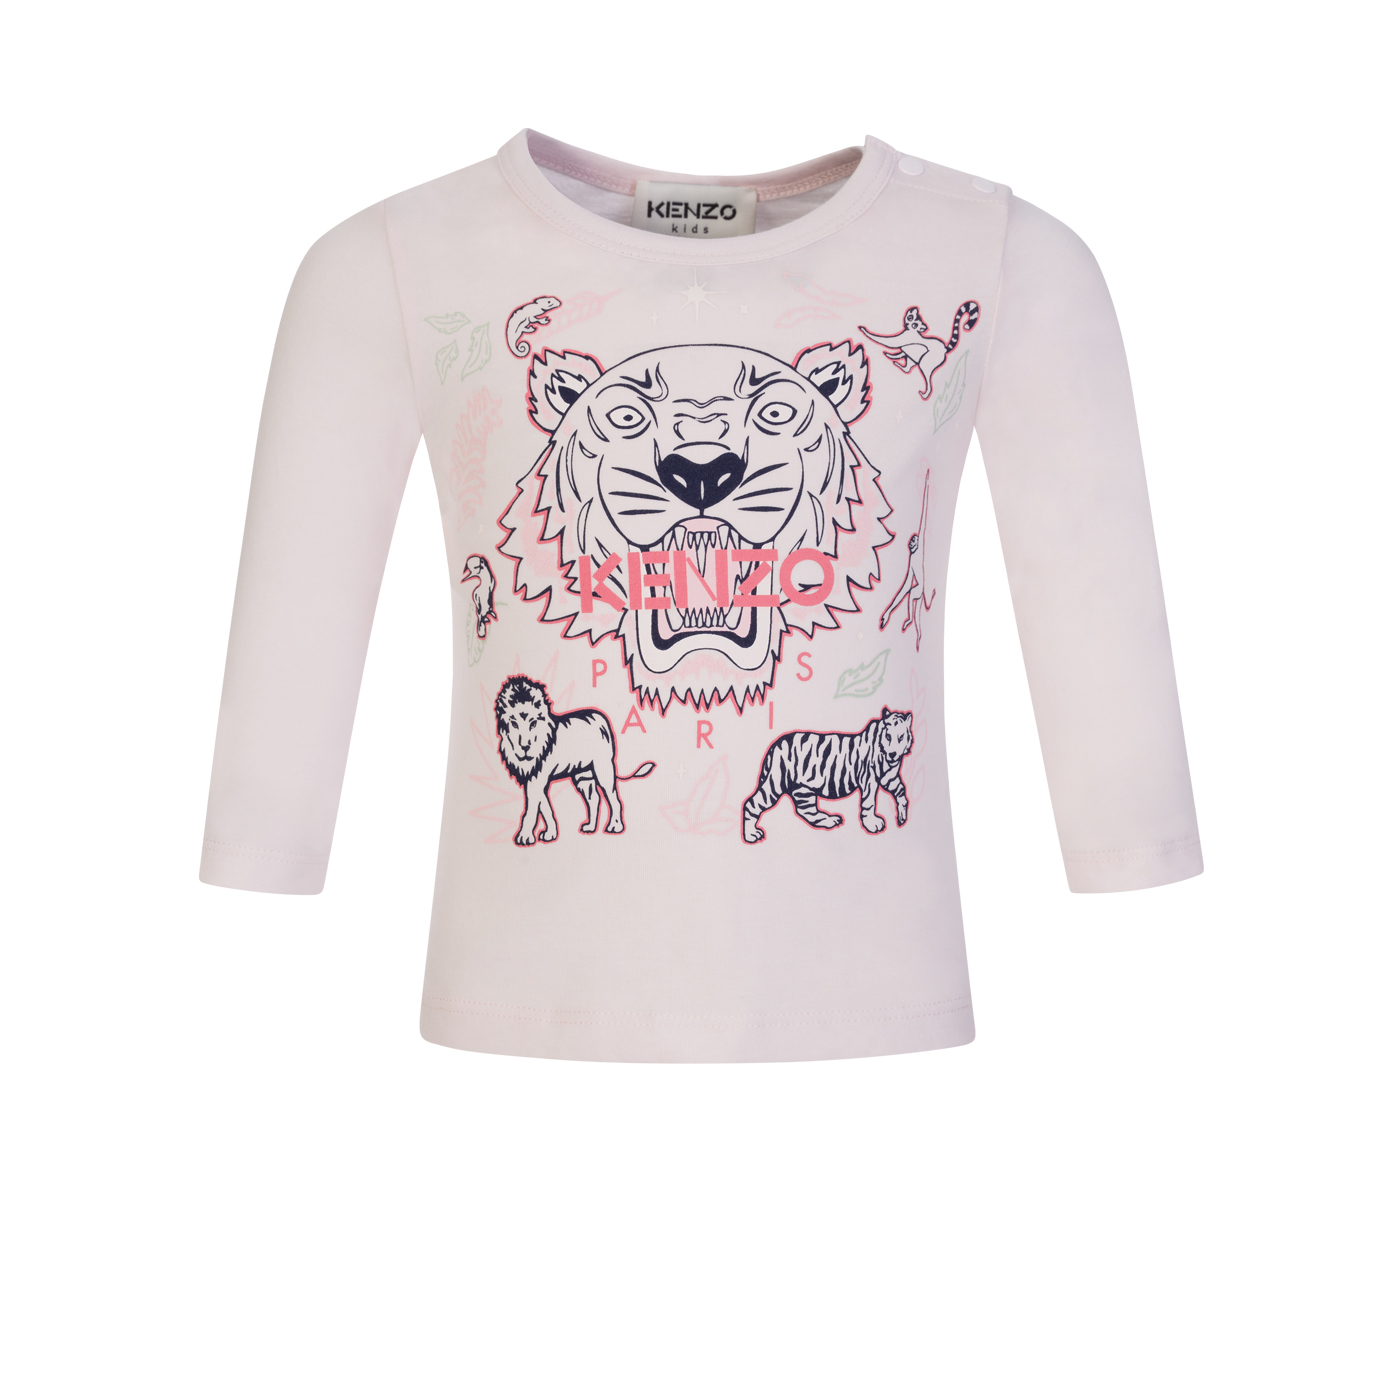 KENZO Kids Pale Pink Tiger Print T-Shirt - Size 1 Year